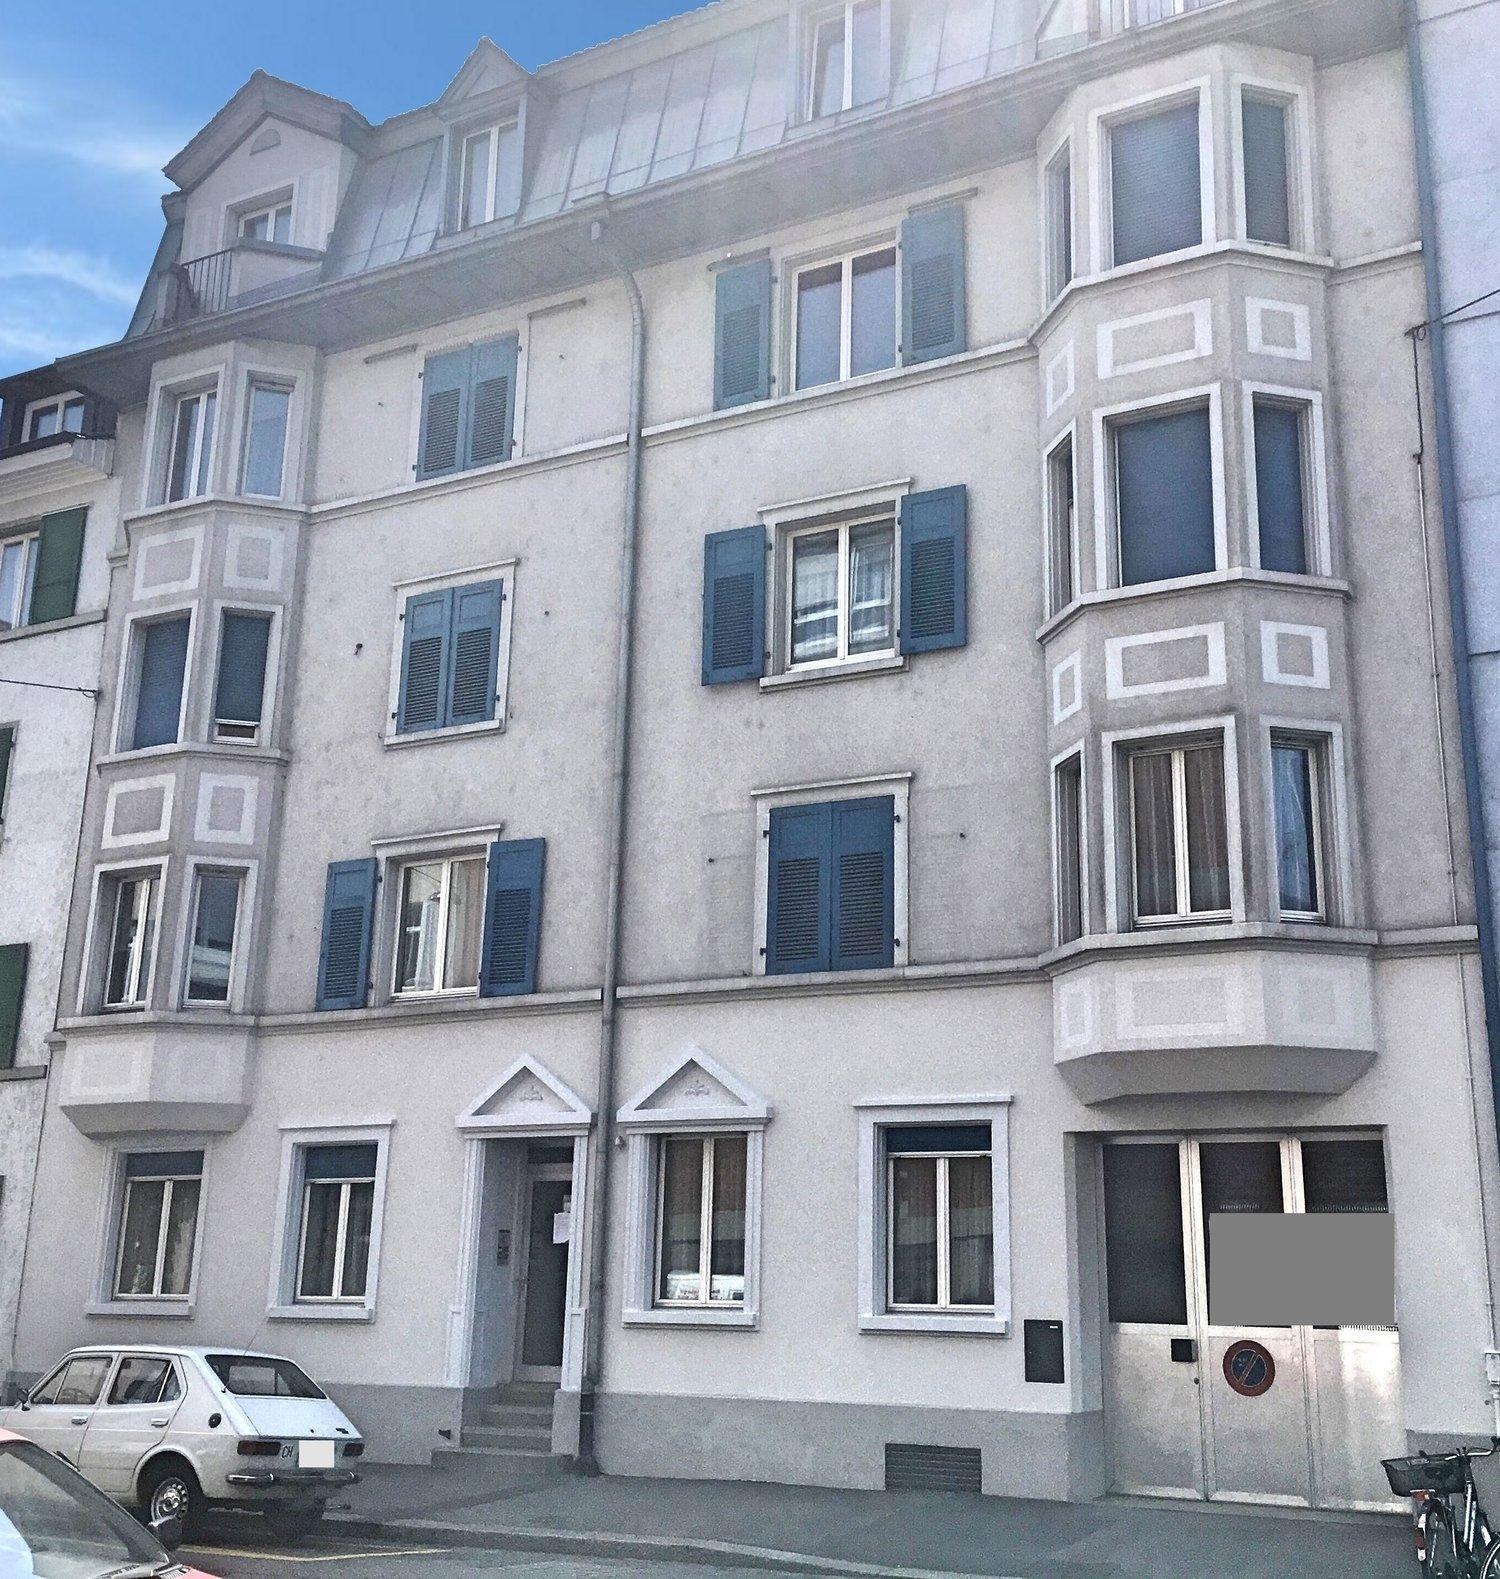 Lothringerstrasse 115